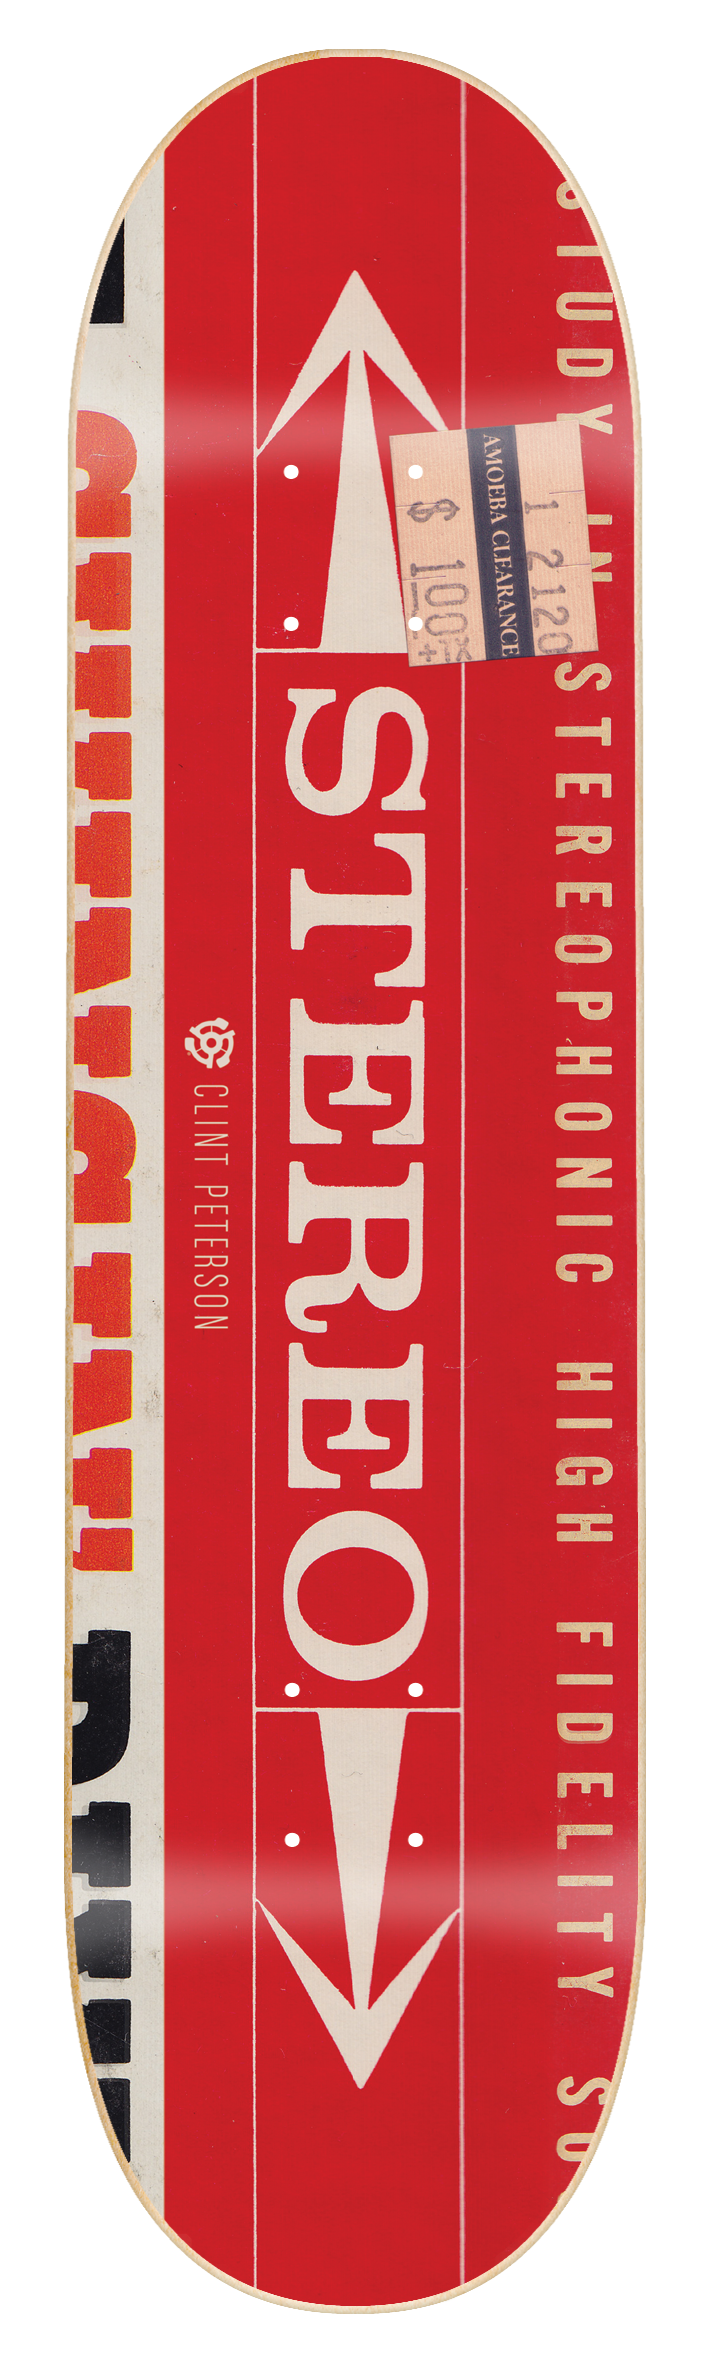 dollar-bin-peterson-deck.png